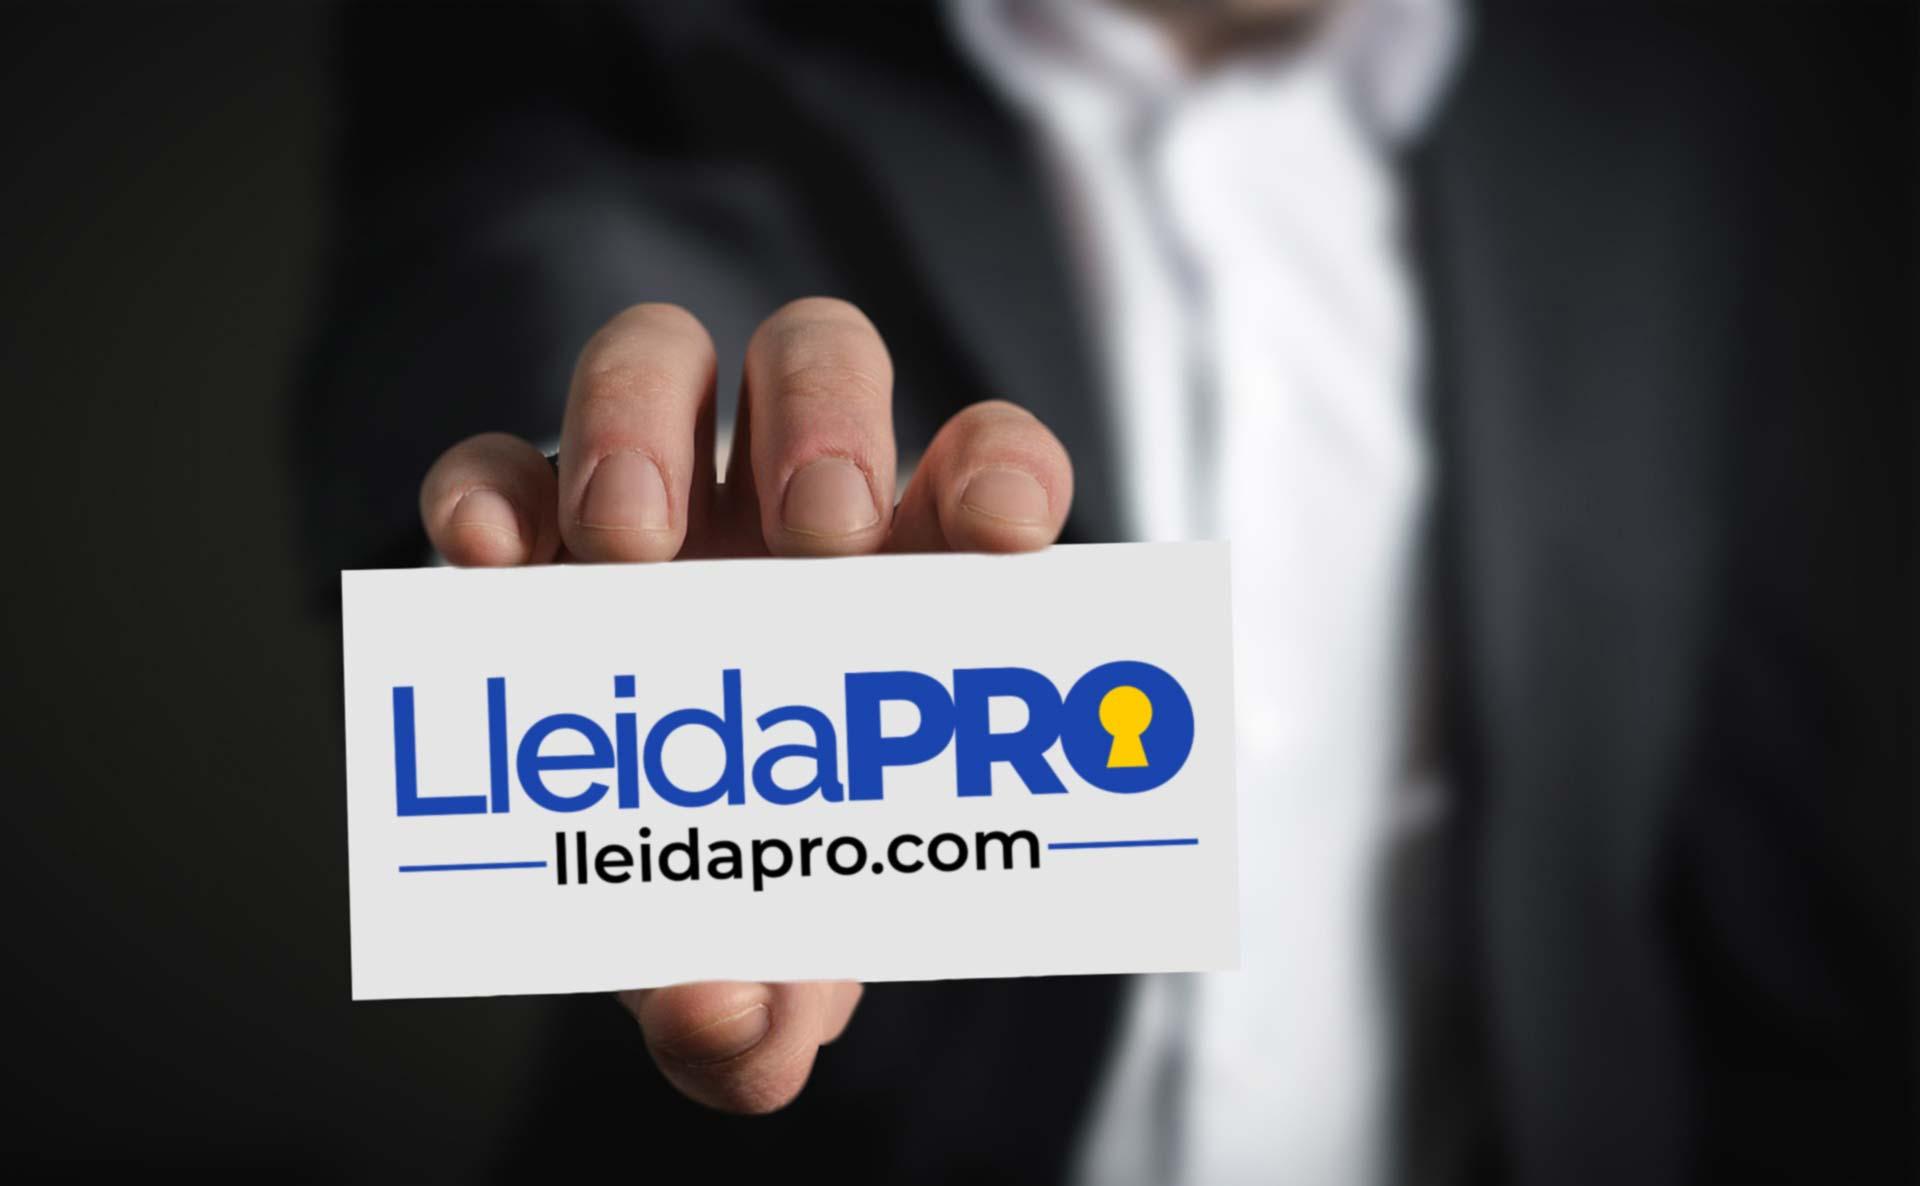 Lleida PRO